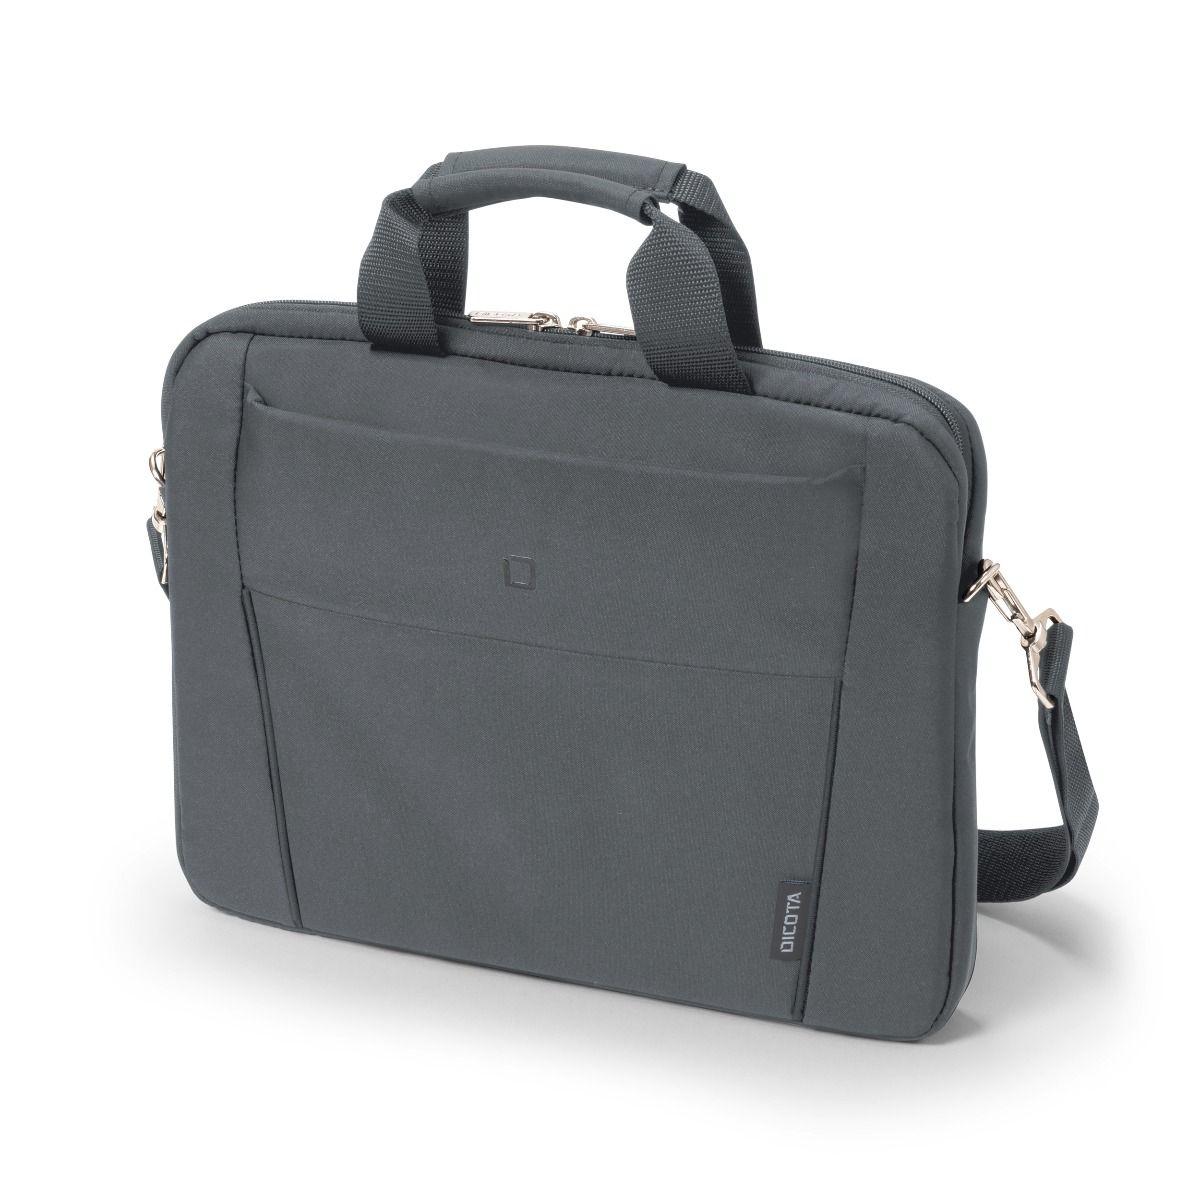 "Dicota Slim Case Base 15-15.6 15.6"" Messenger case Grey"